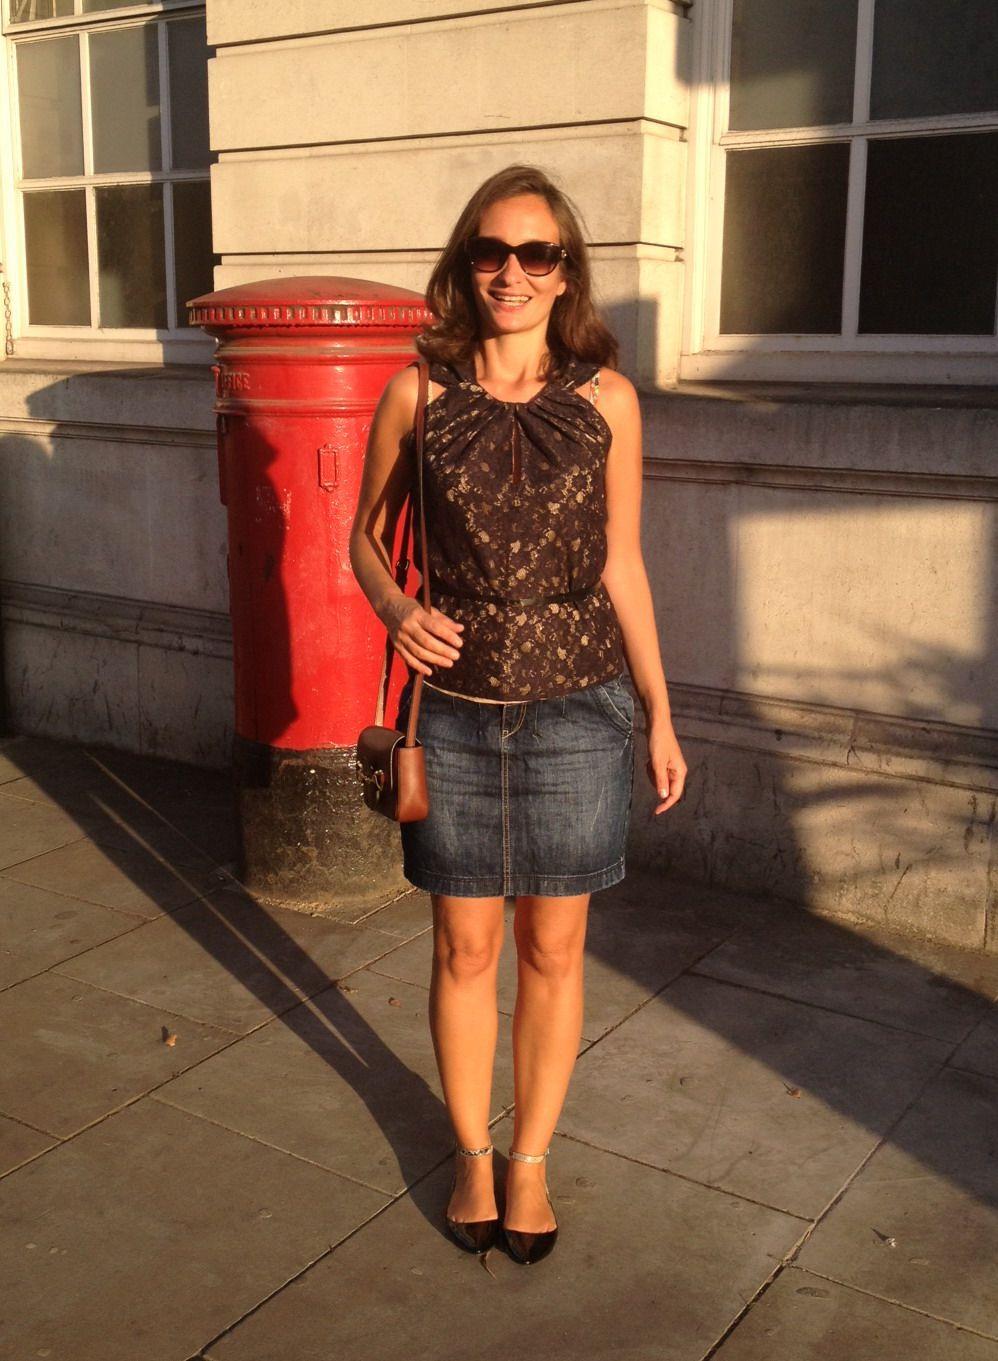 Denim mini skirt outfit ideas - Google Search | Skirts | Pinterest | Pencil skirts Denim mini ...